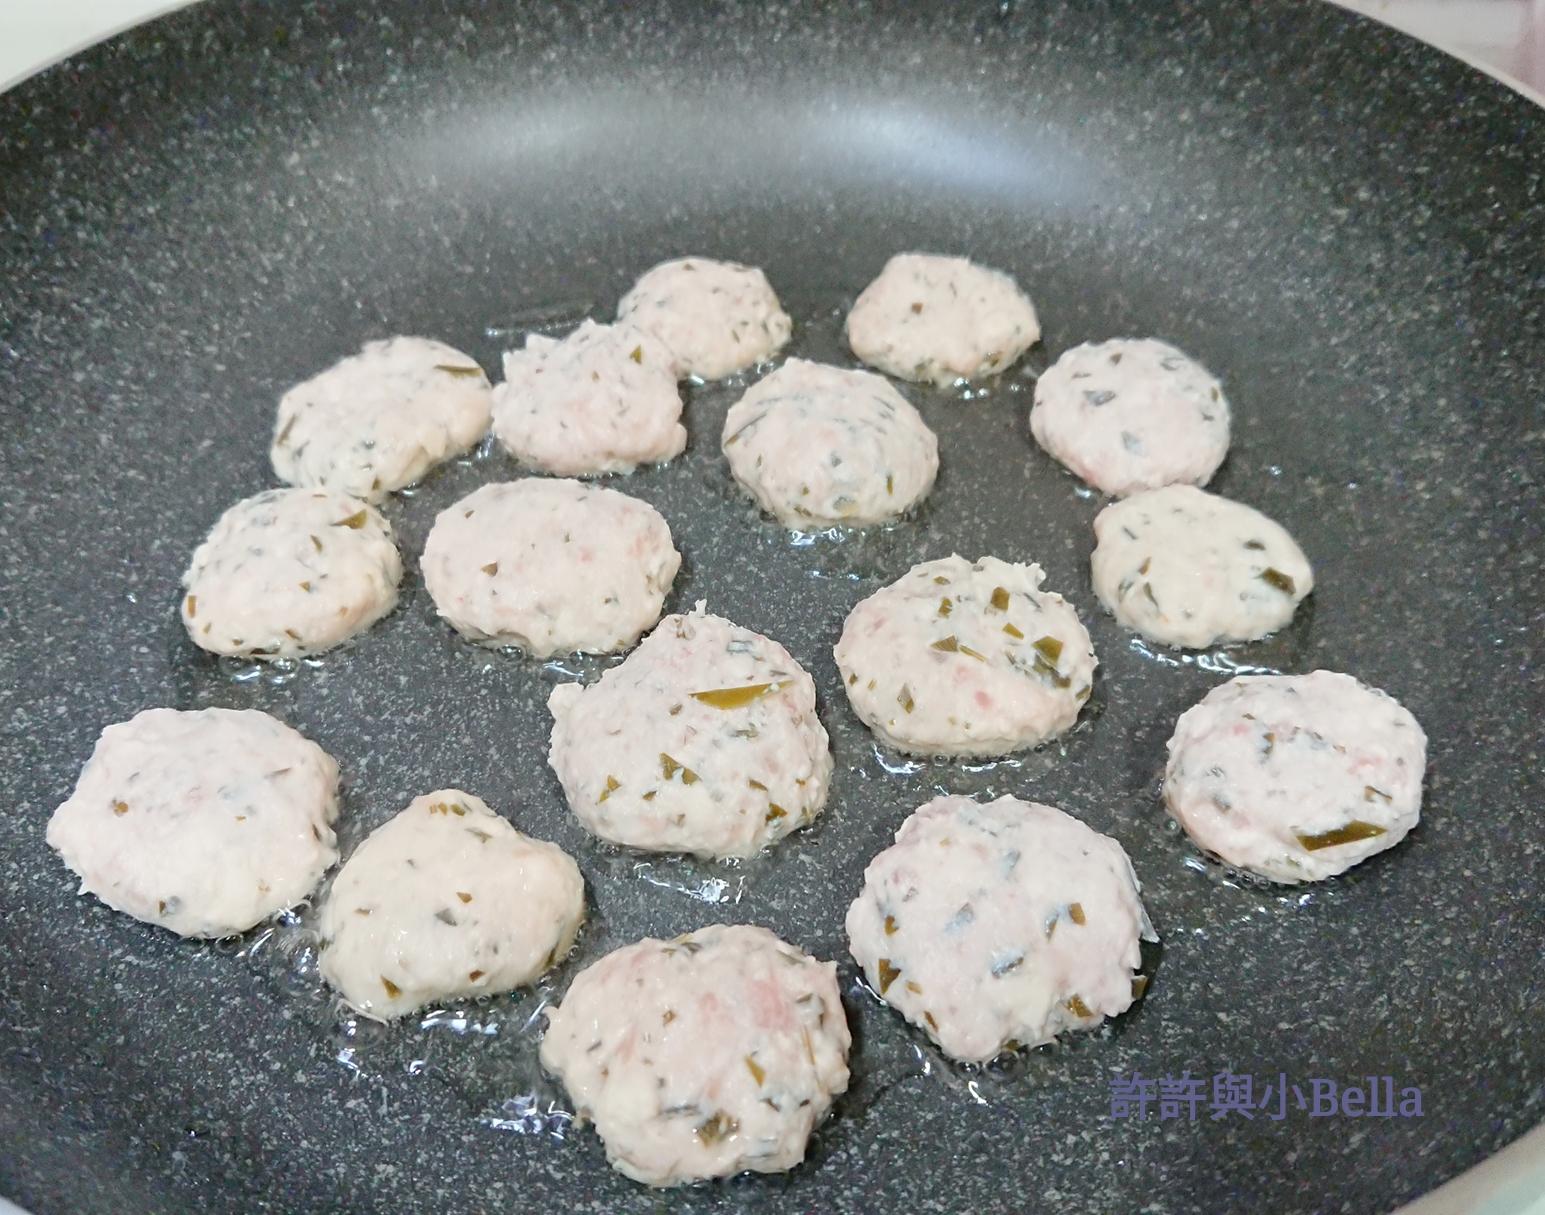 BB食譜:軟綿綿迷你昆布豆腐漢堡扒|許許與小Bella